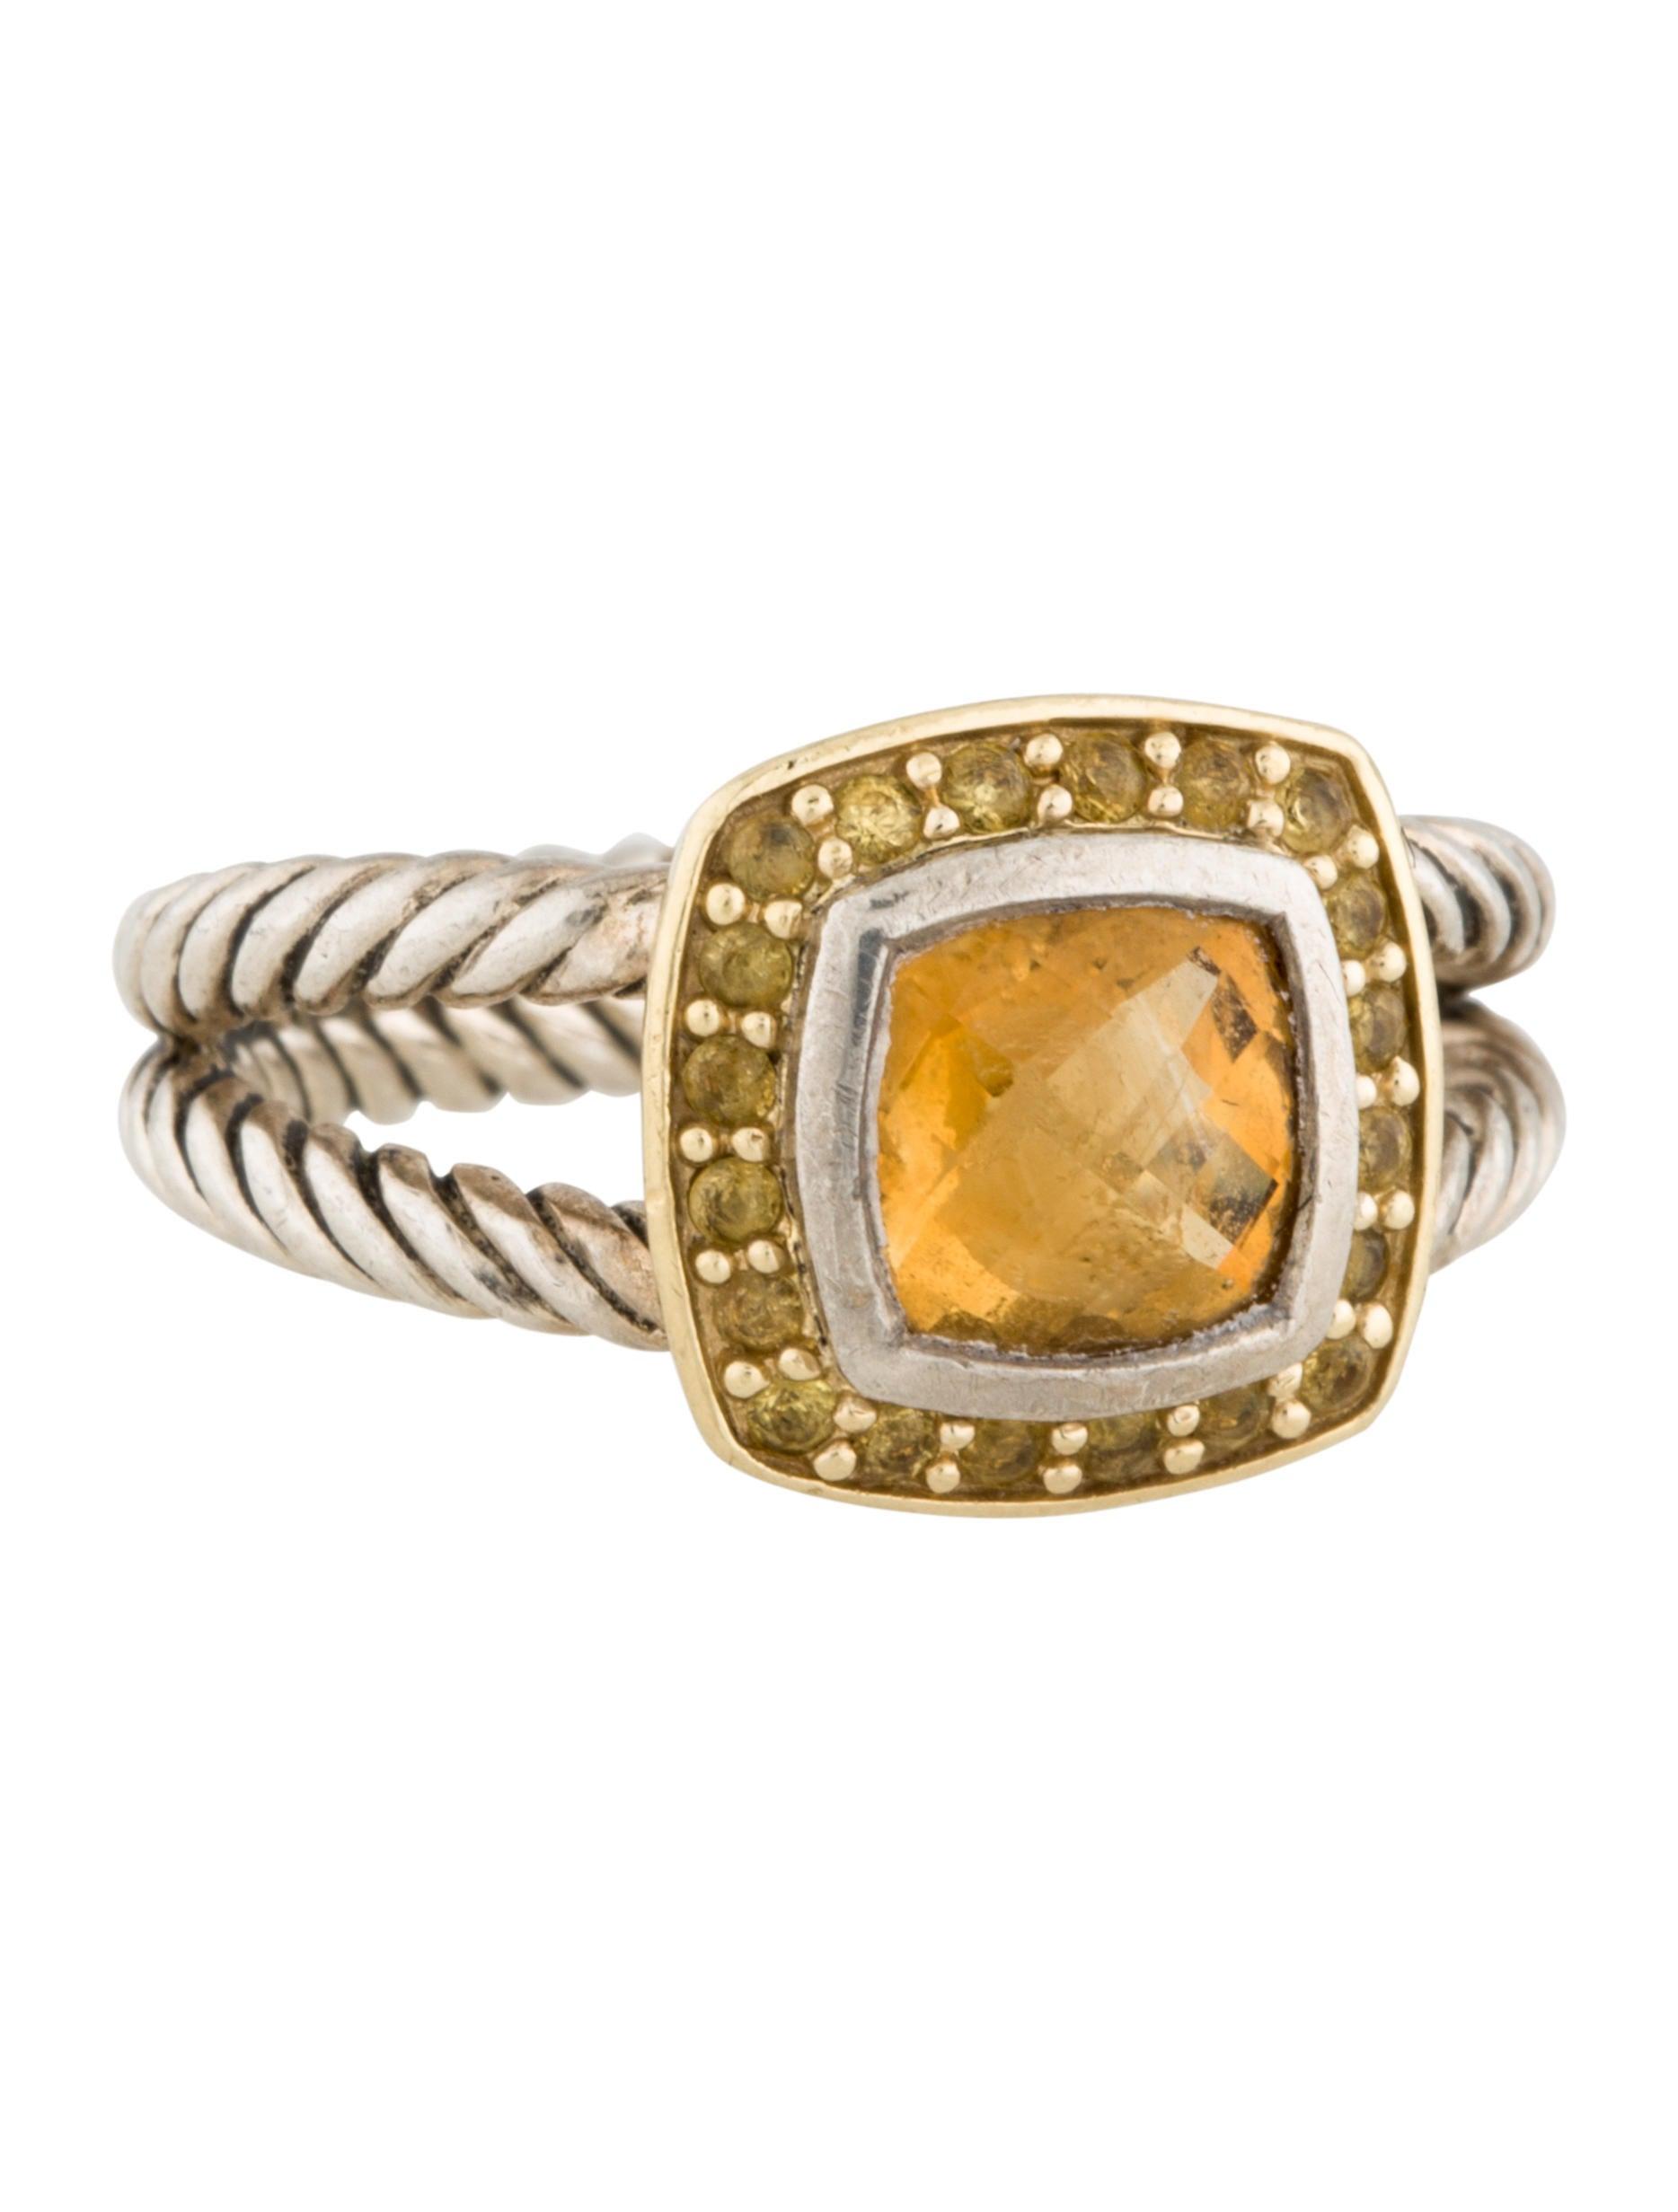 David yurman petite citrine albion ring rings dvy27950 for David yurman inspired jewelry rings